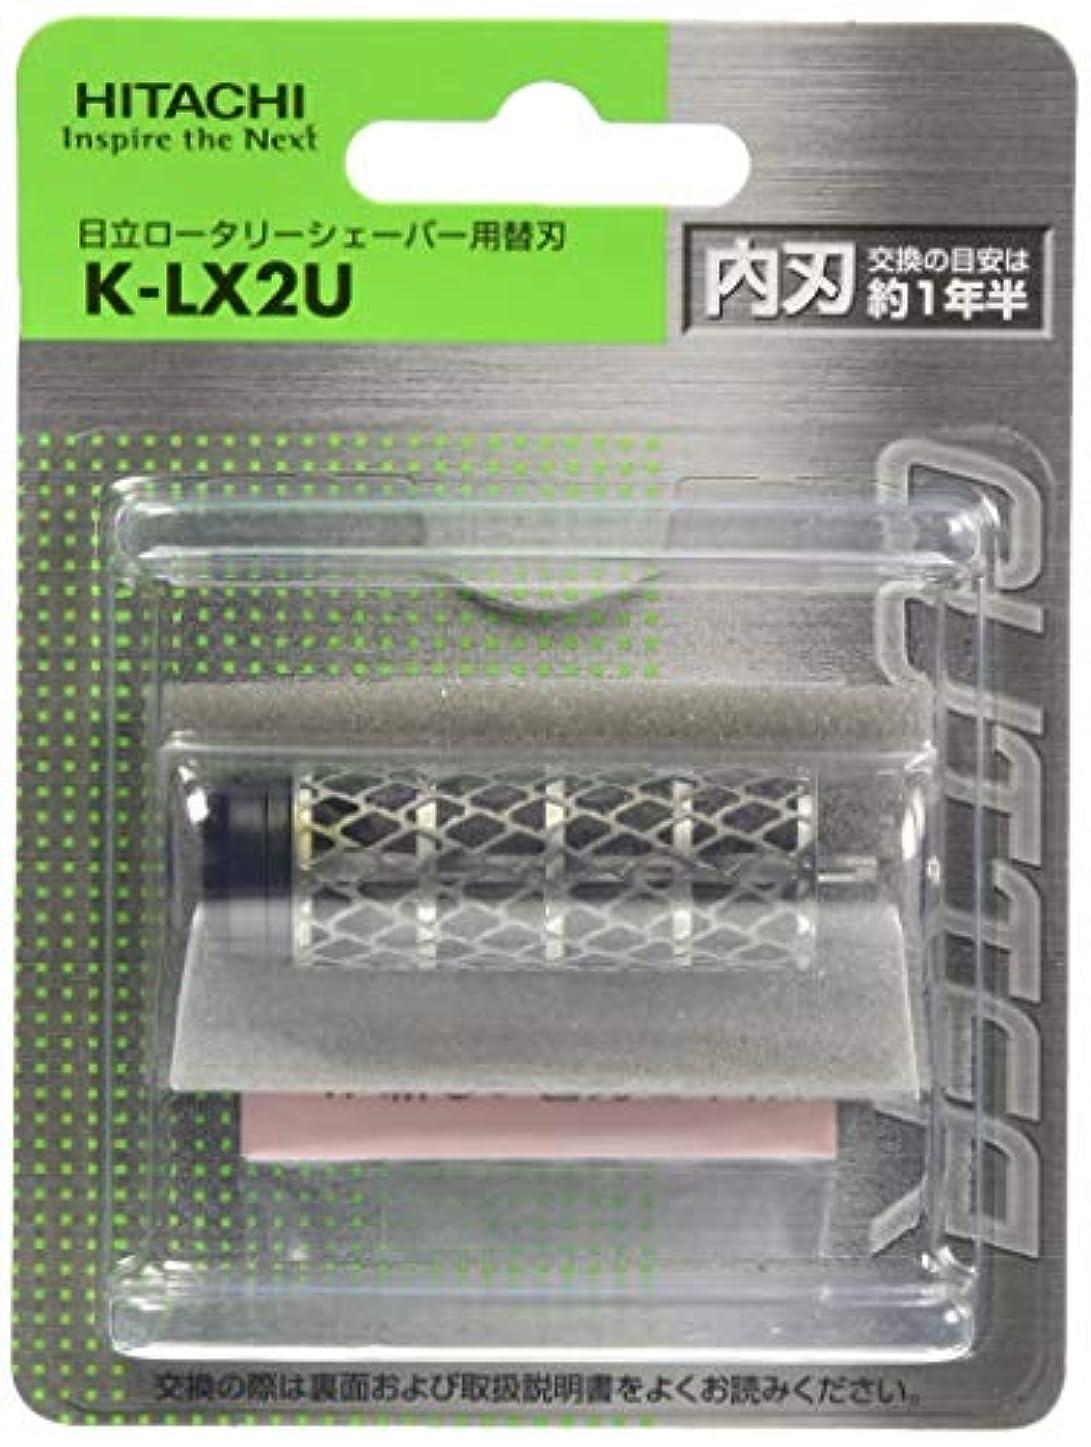 充電好奇心定常日立 シェーバー用替刃(内刃) K-LX2U